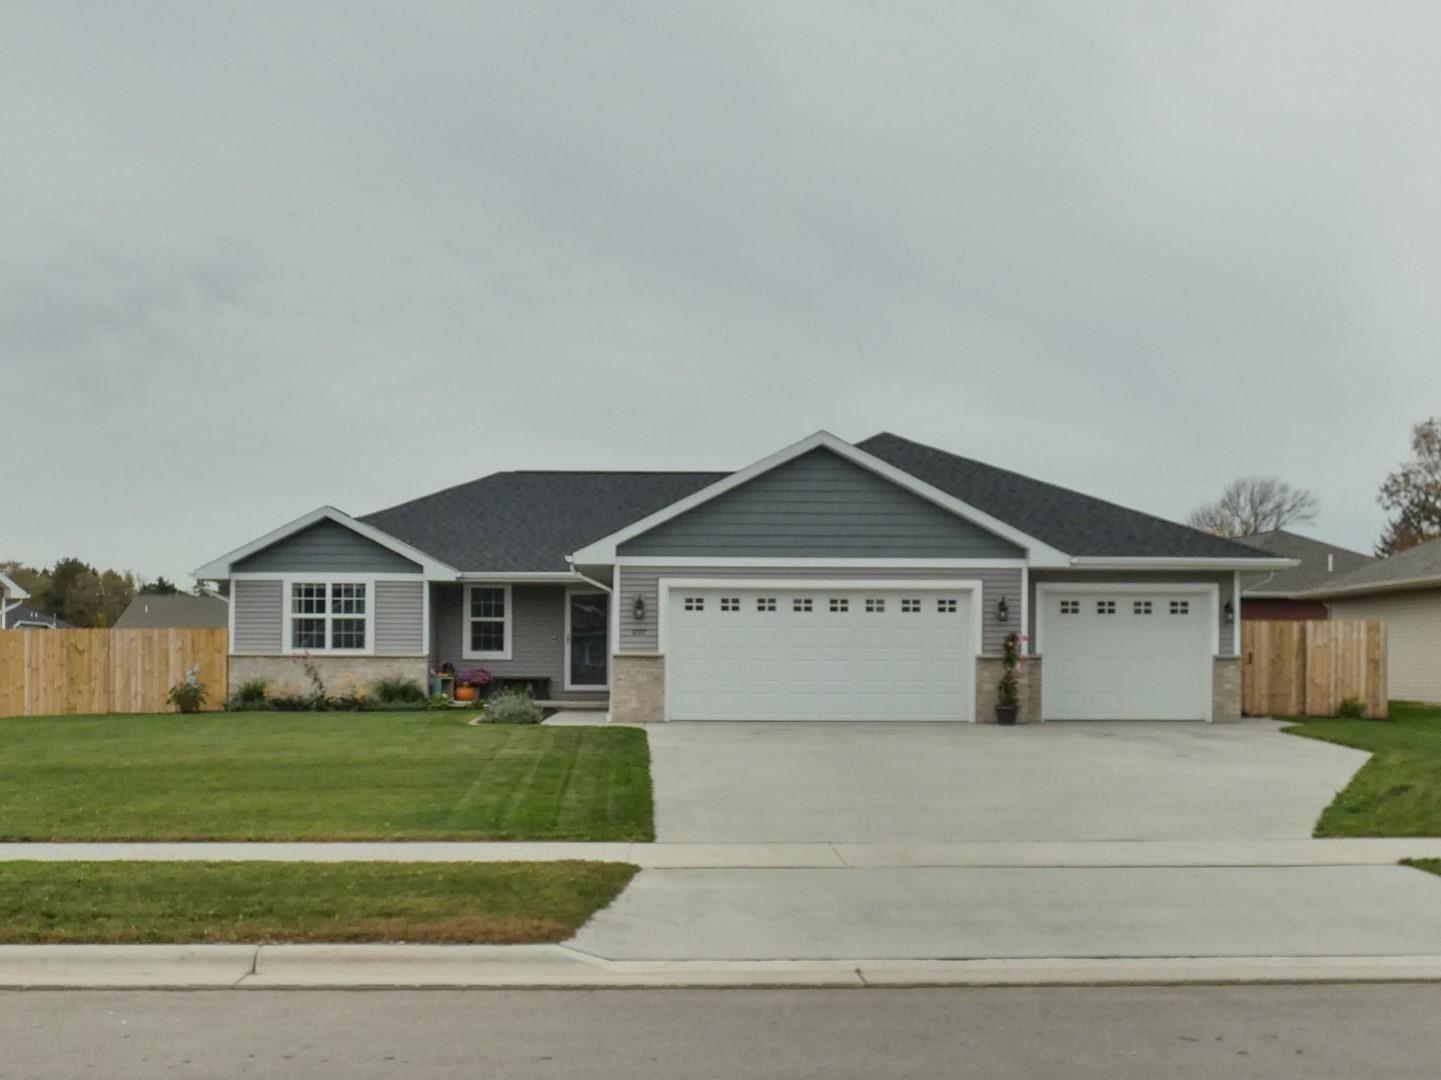 1777 JEROME Way, Green Bay, WI 54313 - MLS#: 50249510